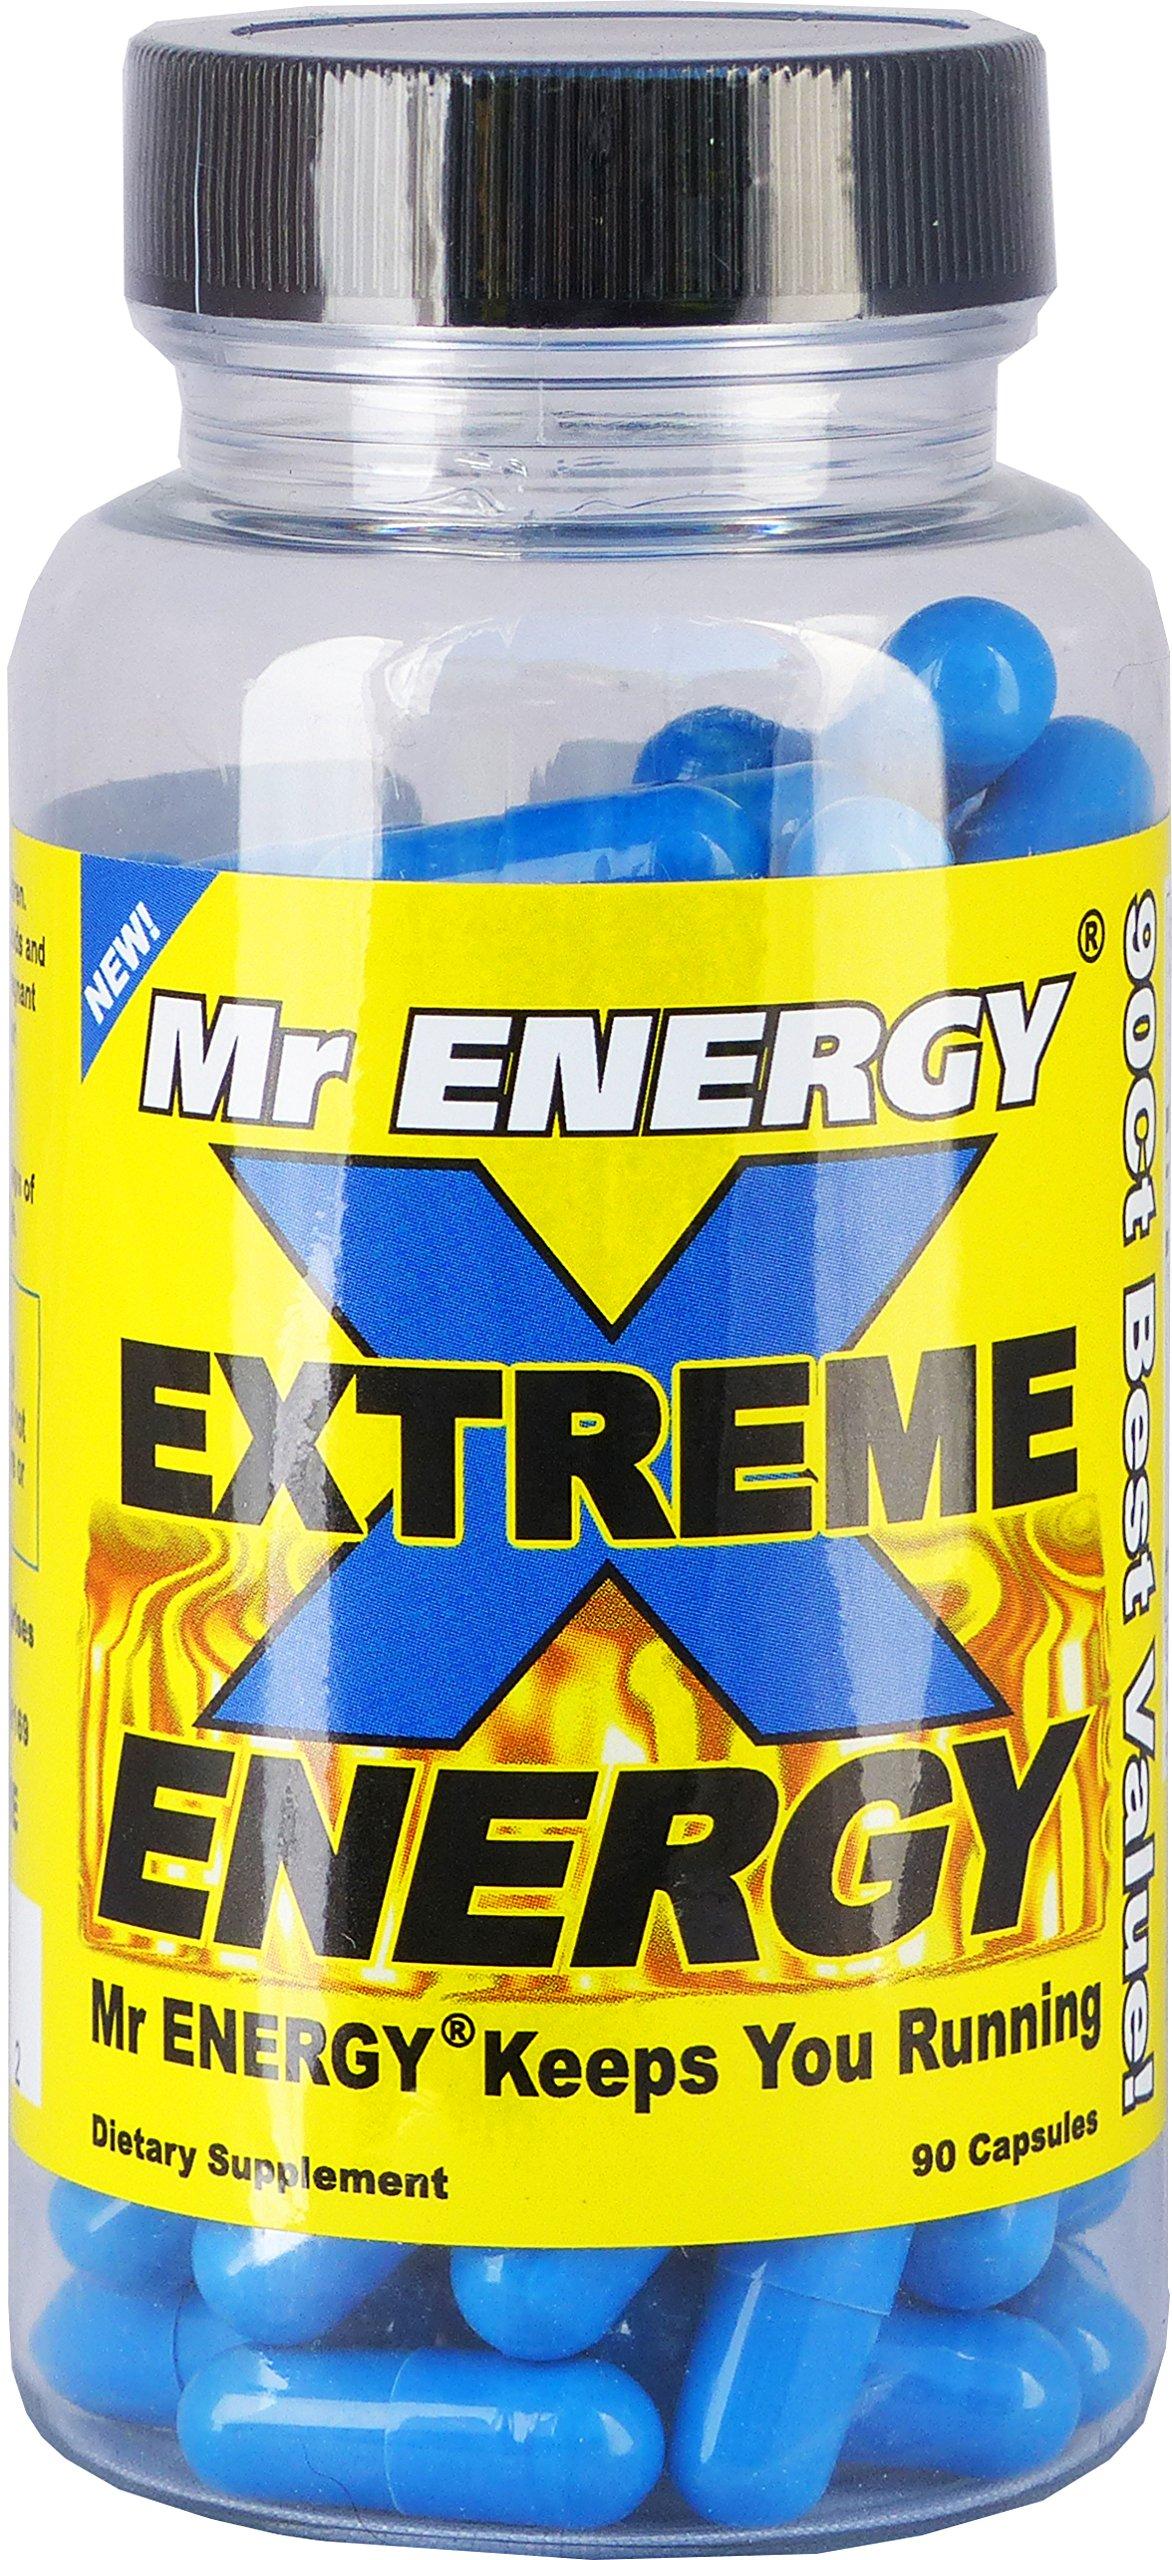 Mr ENERGY EXTREME ENERGY Pills 90 Capsules by Mr ENERGY